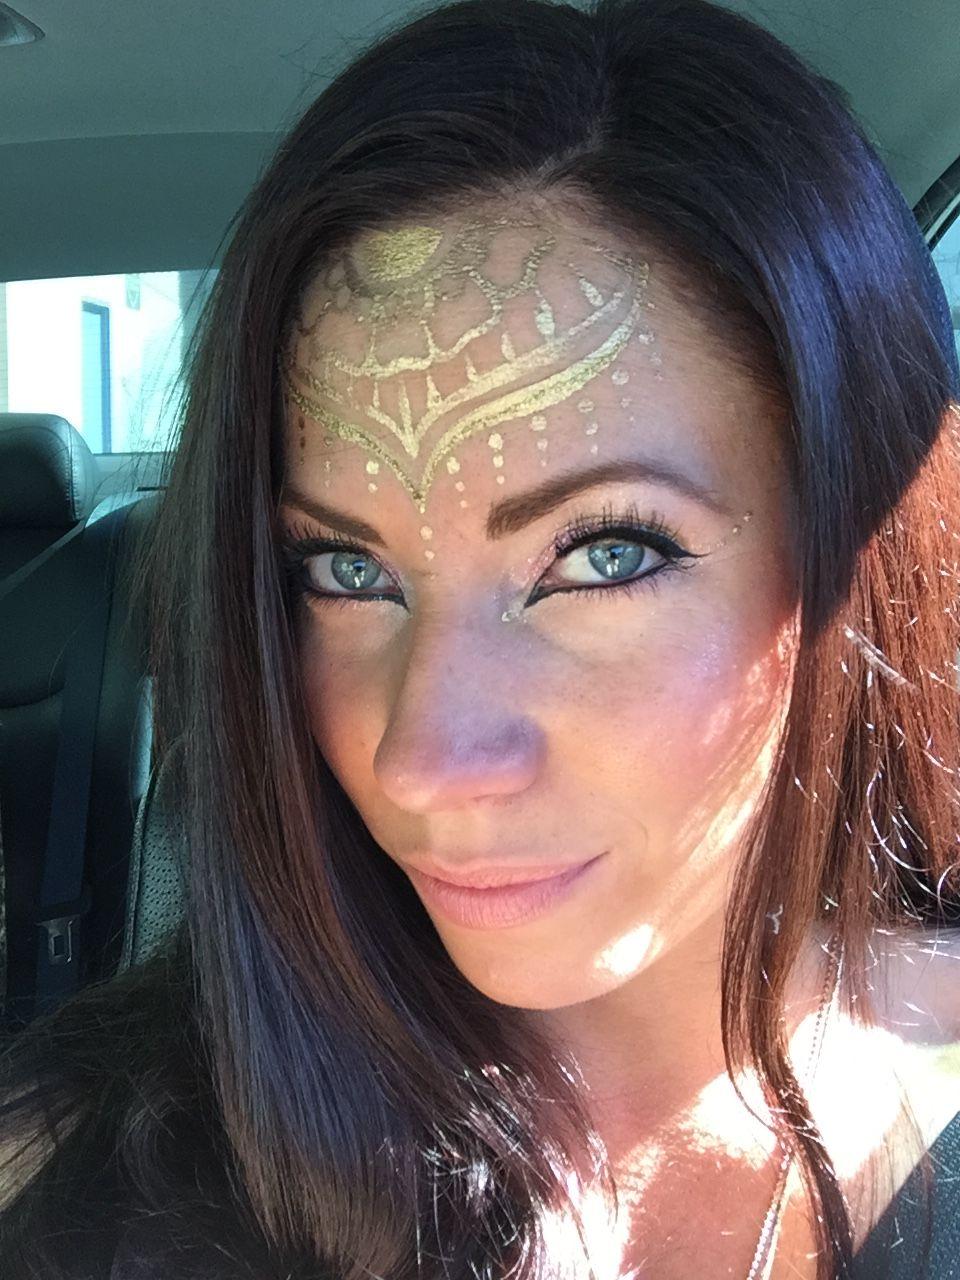 Kesha Halloween Costumes | Makeup, Costumes and Halloween ideas